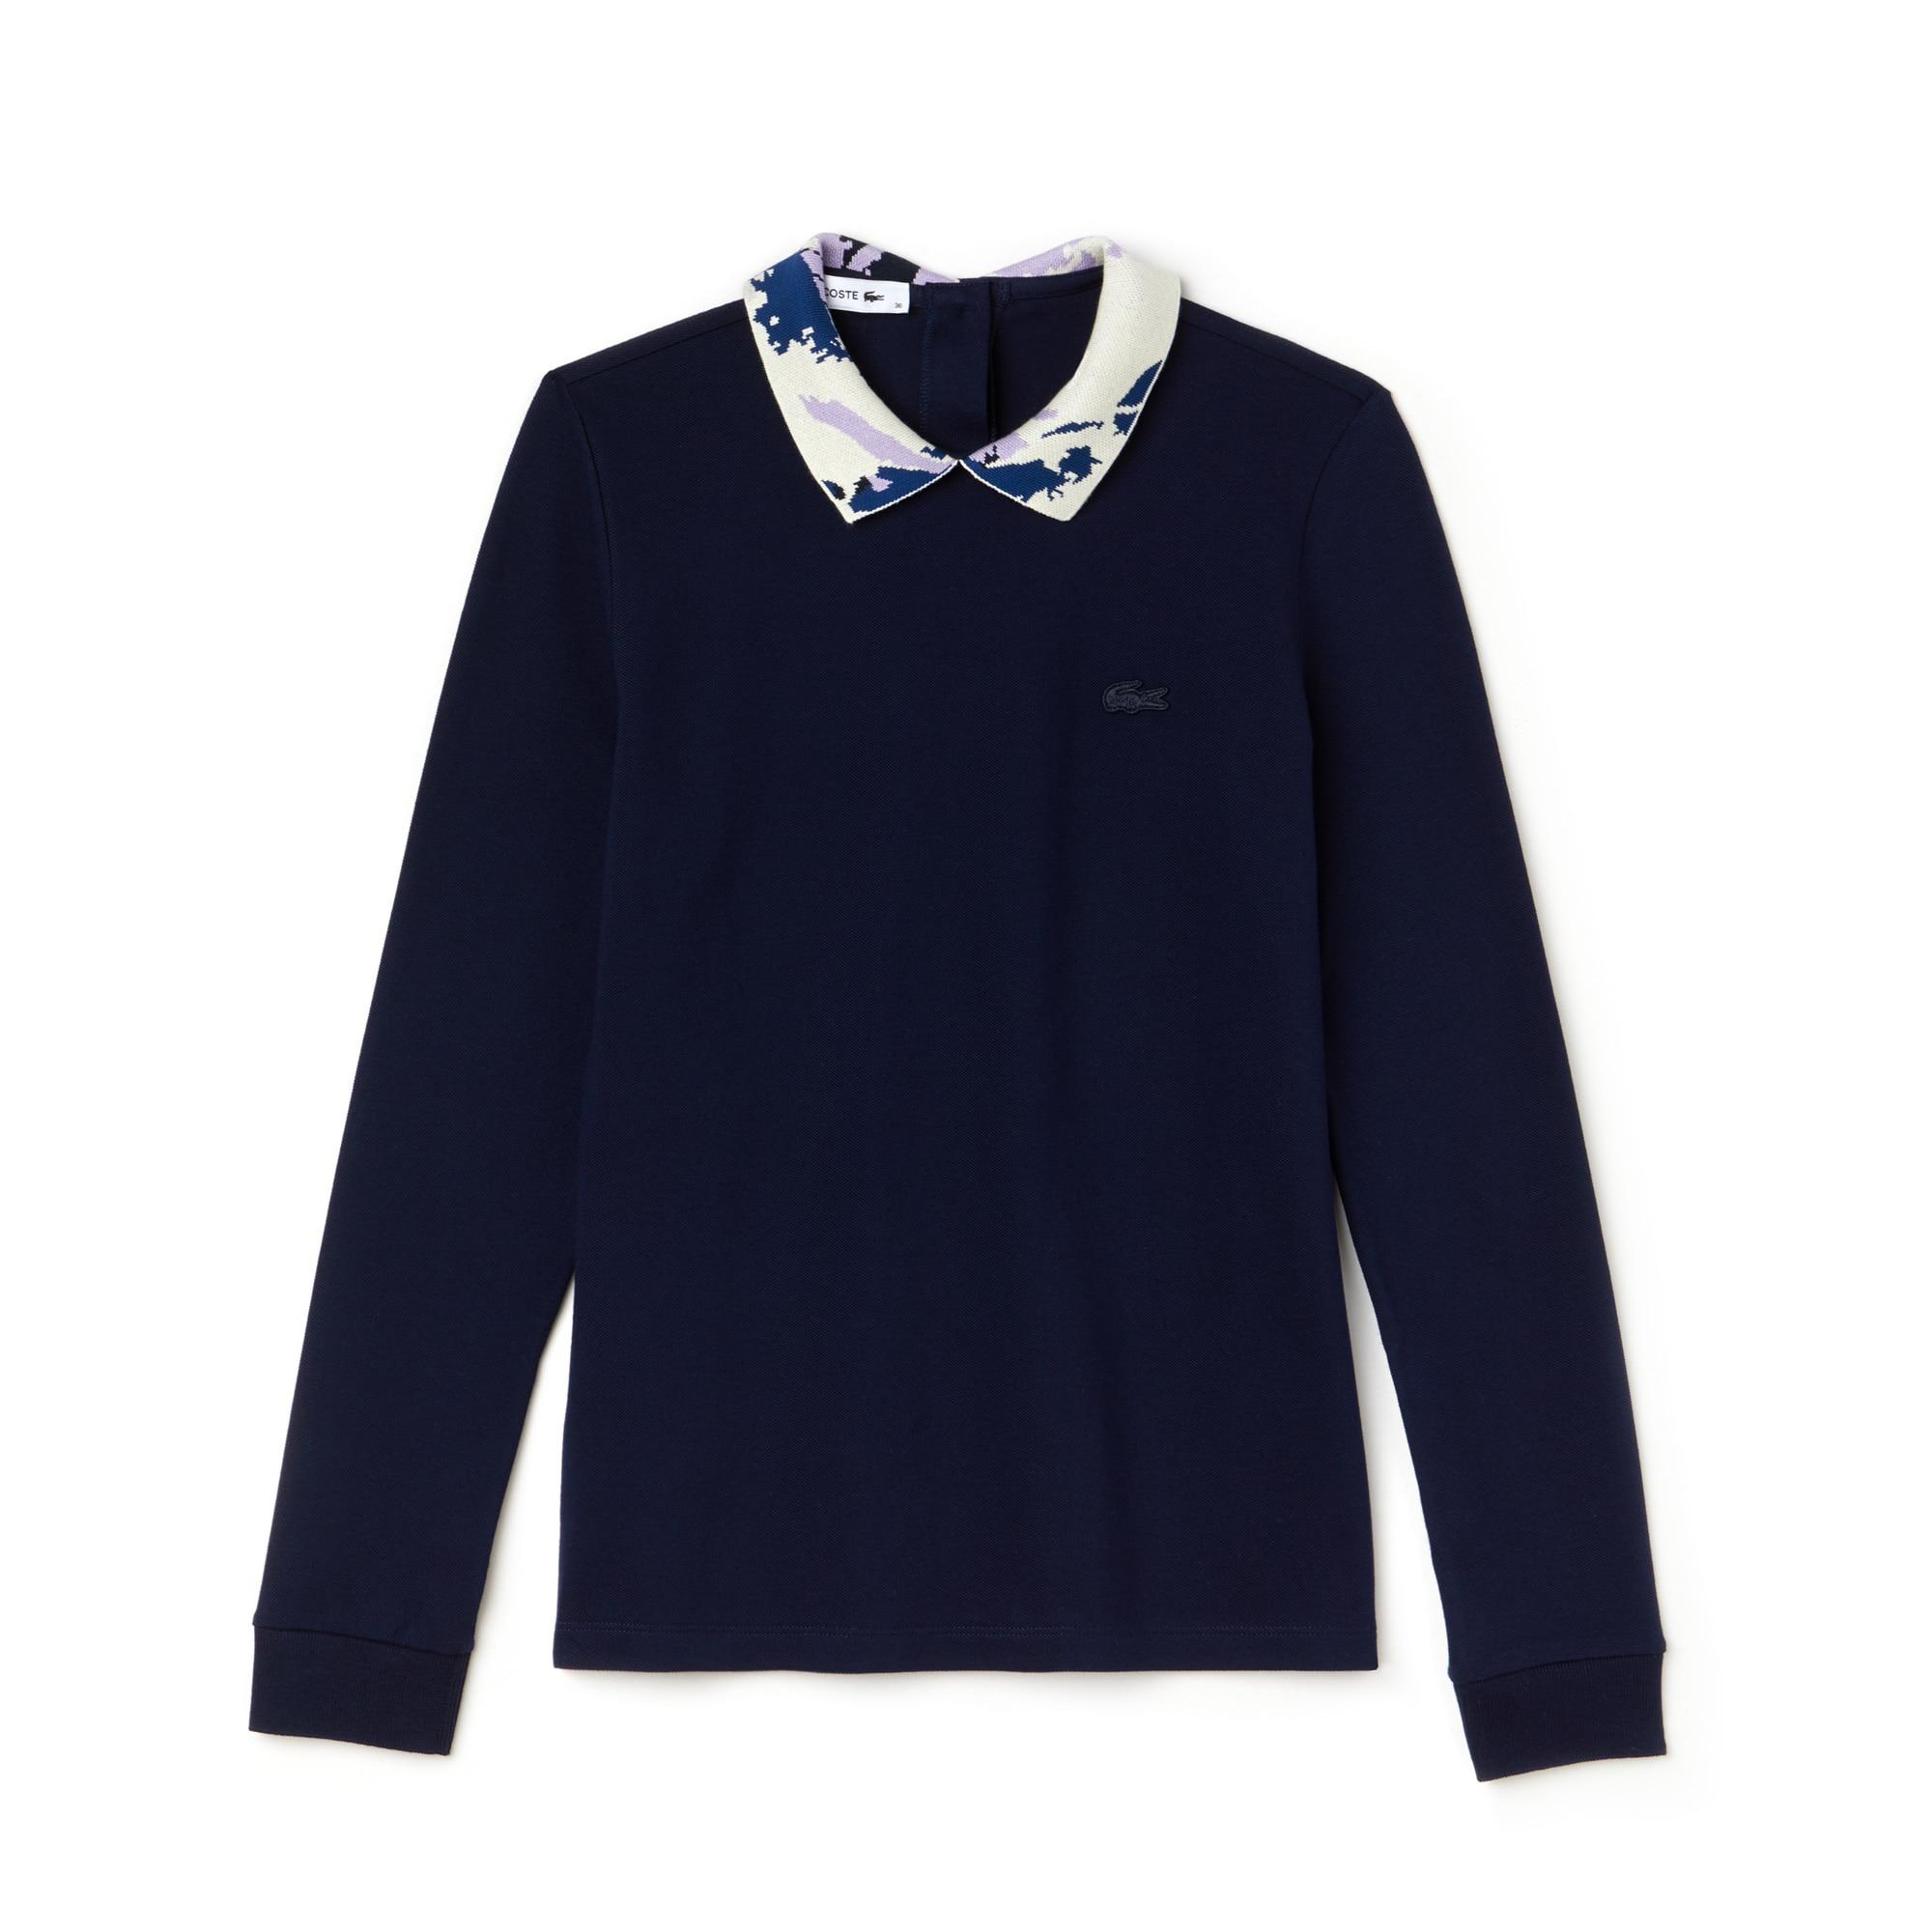 Damen LACOSTE Poloshirt aus Mini-Piqué mit Stretch